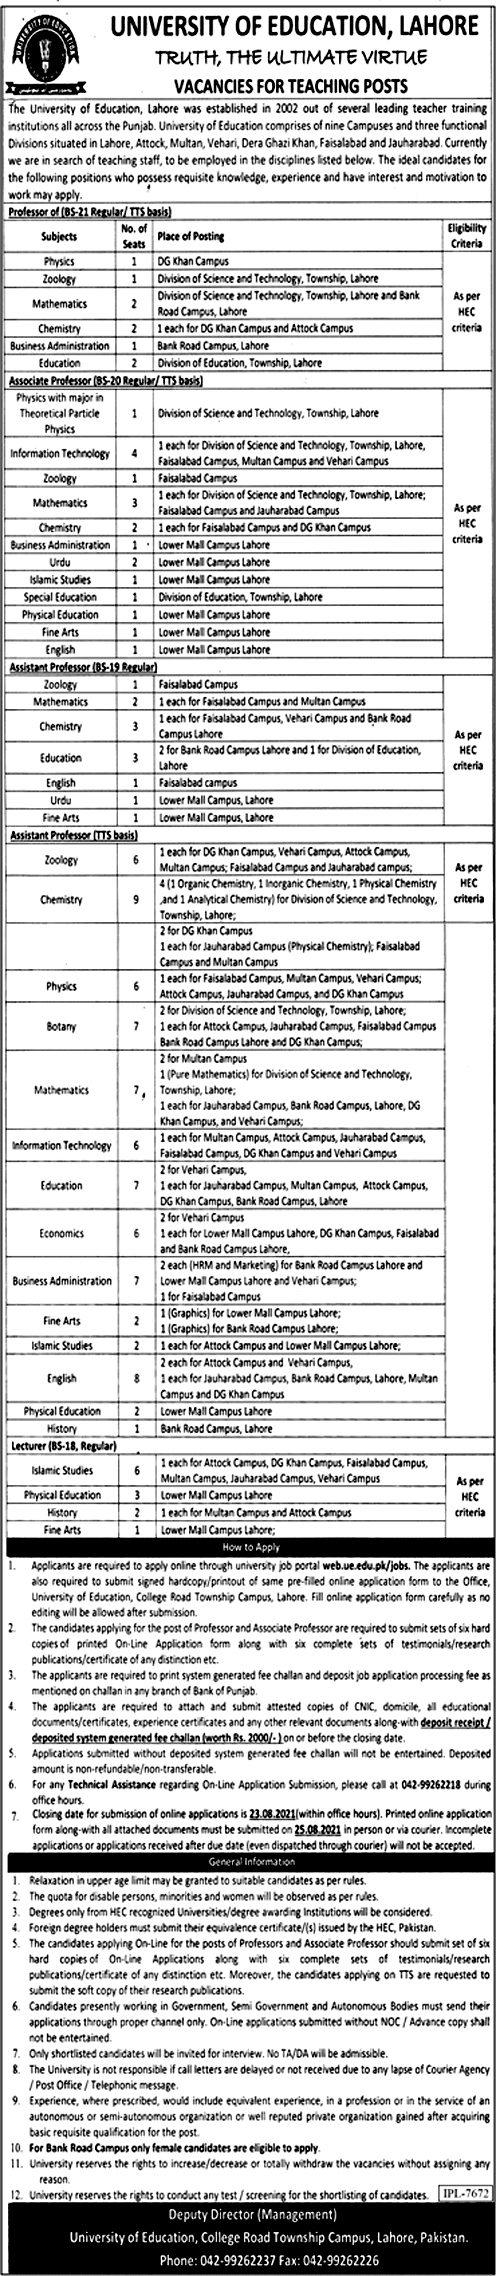 Latest Jobs in University of Education UE 2021- Apply online